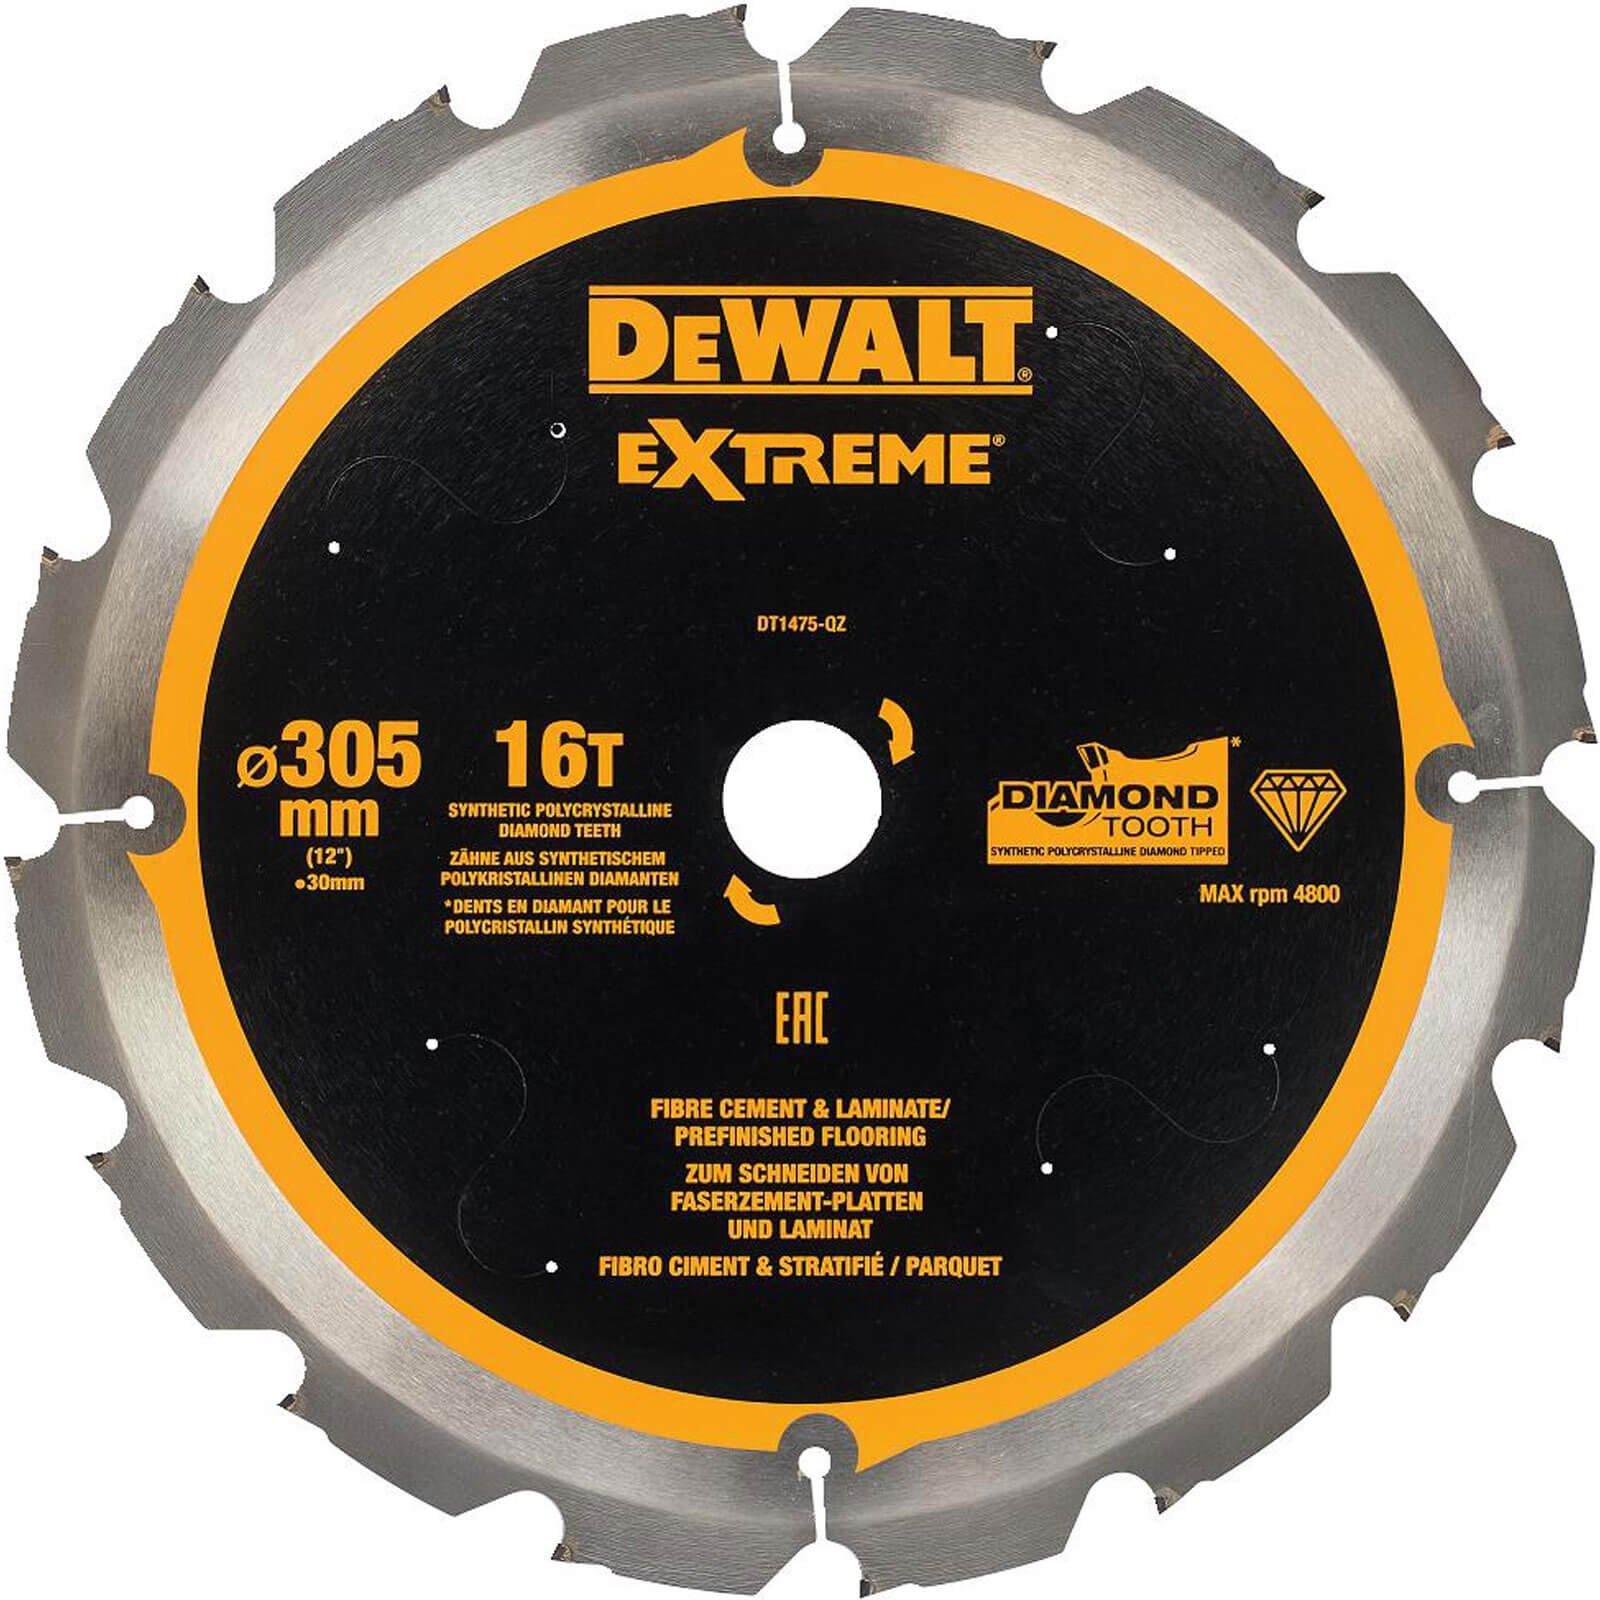 DeWalt PCD Fibre Cement Saw Blade 305mm 16T 30mm